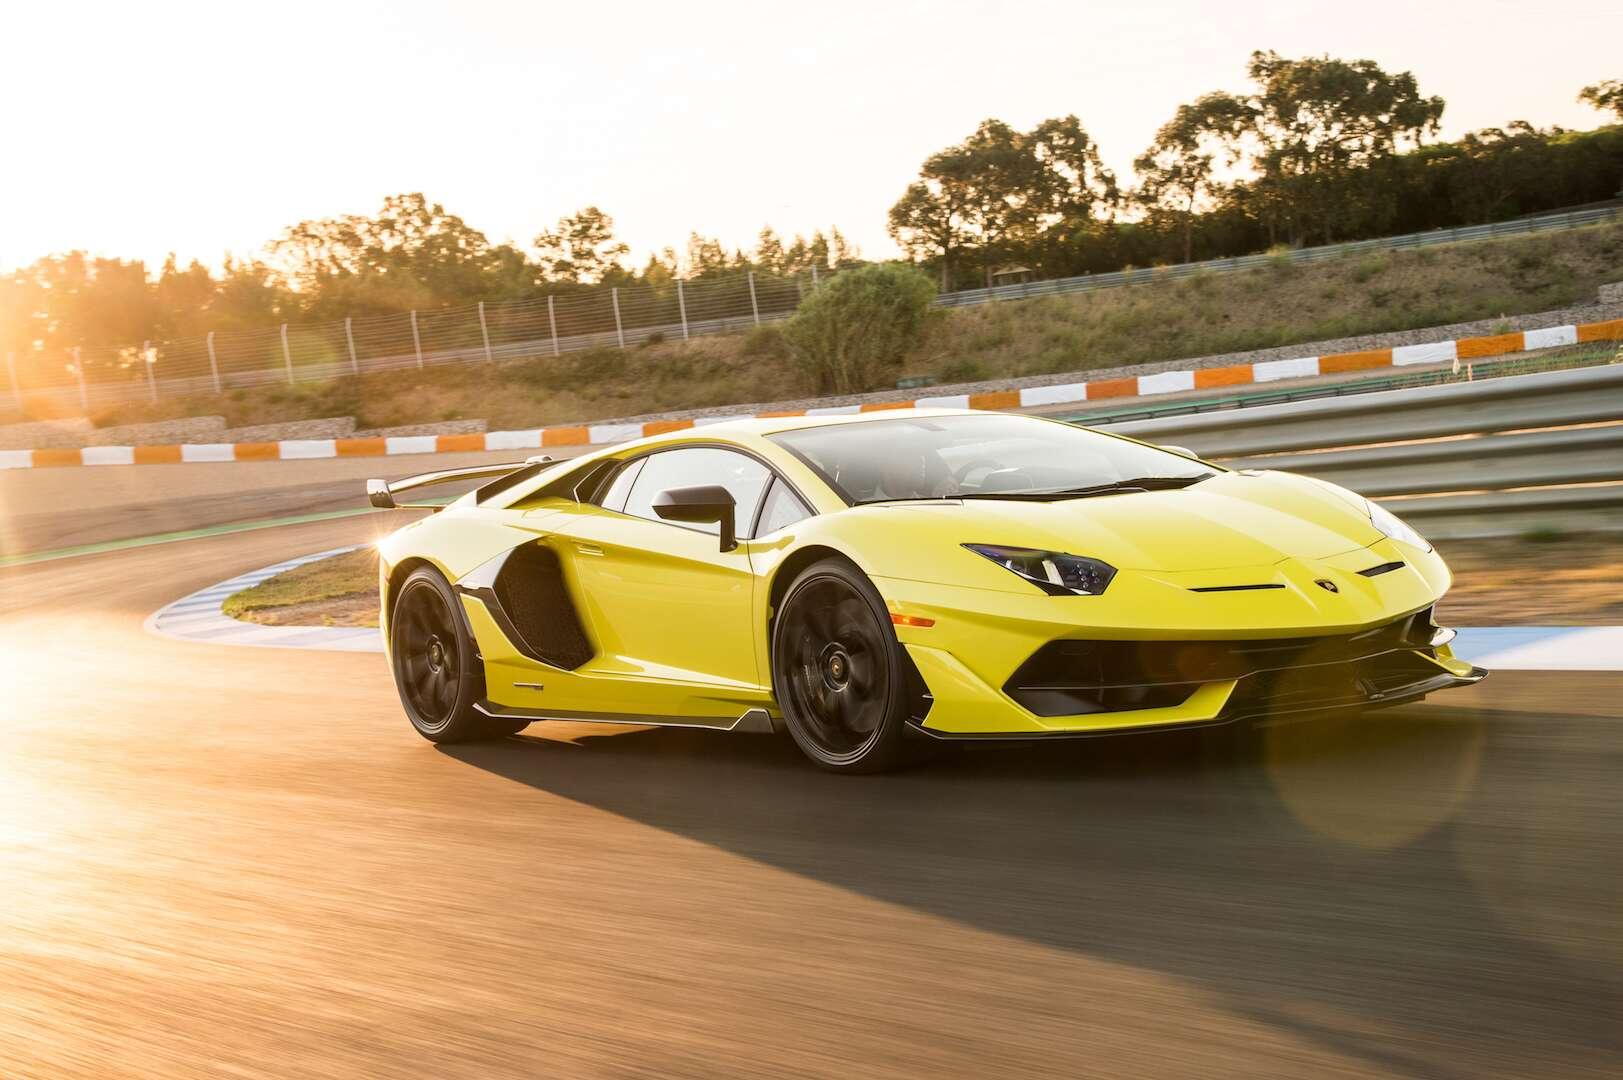 2019 Lamborghini Aventador Matte Black Lamborghini Cars Review